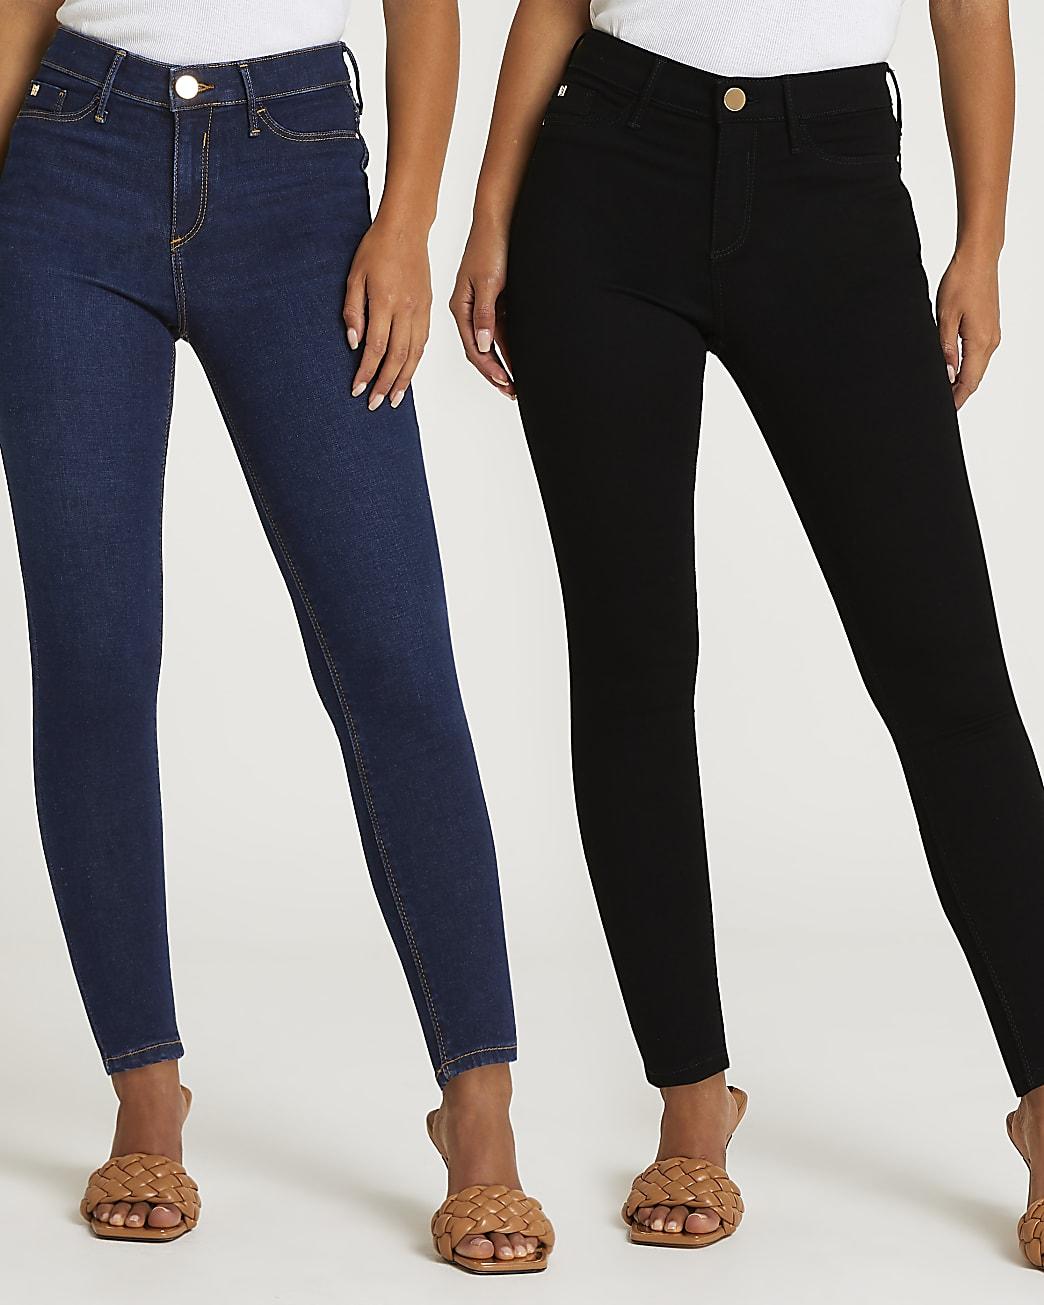 Petite black Molly skinny jeans multipack